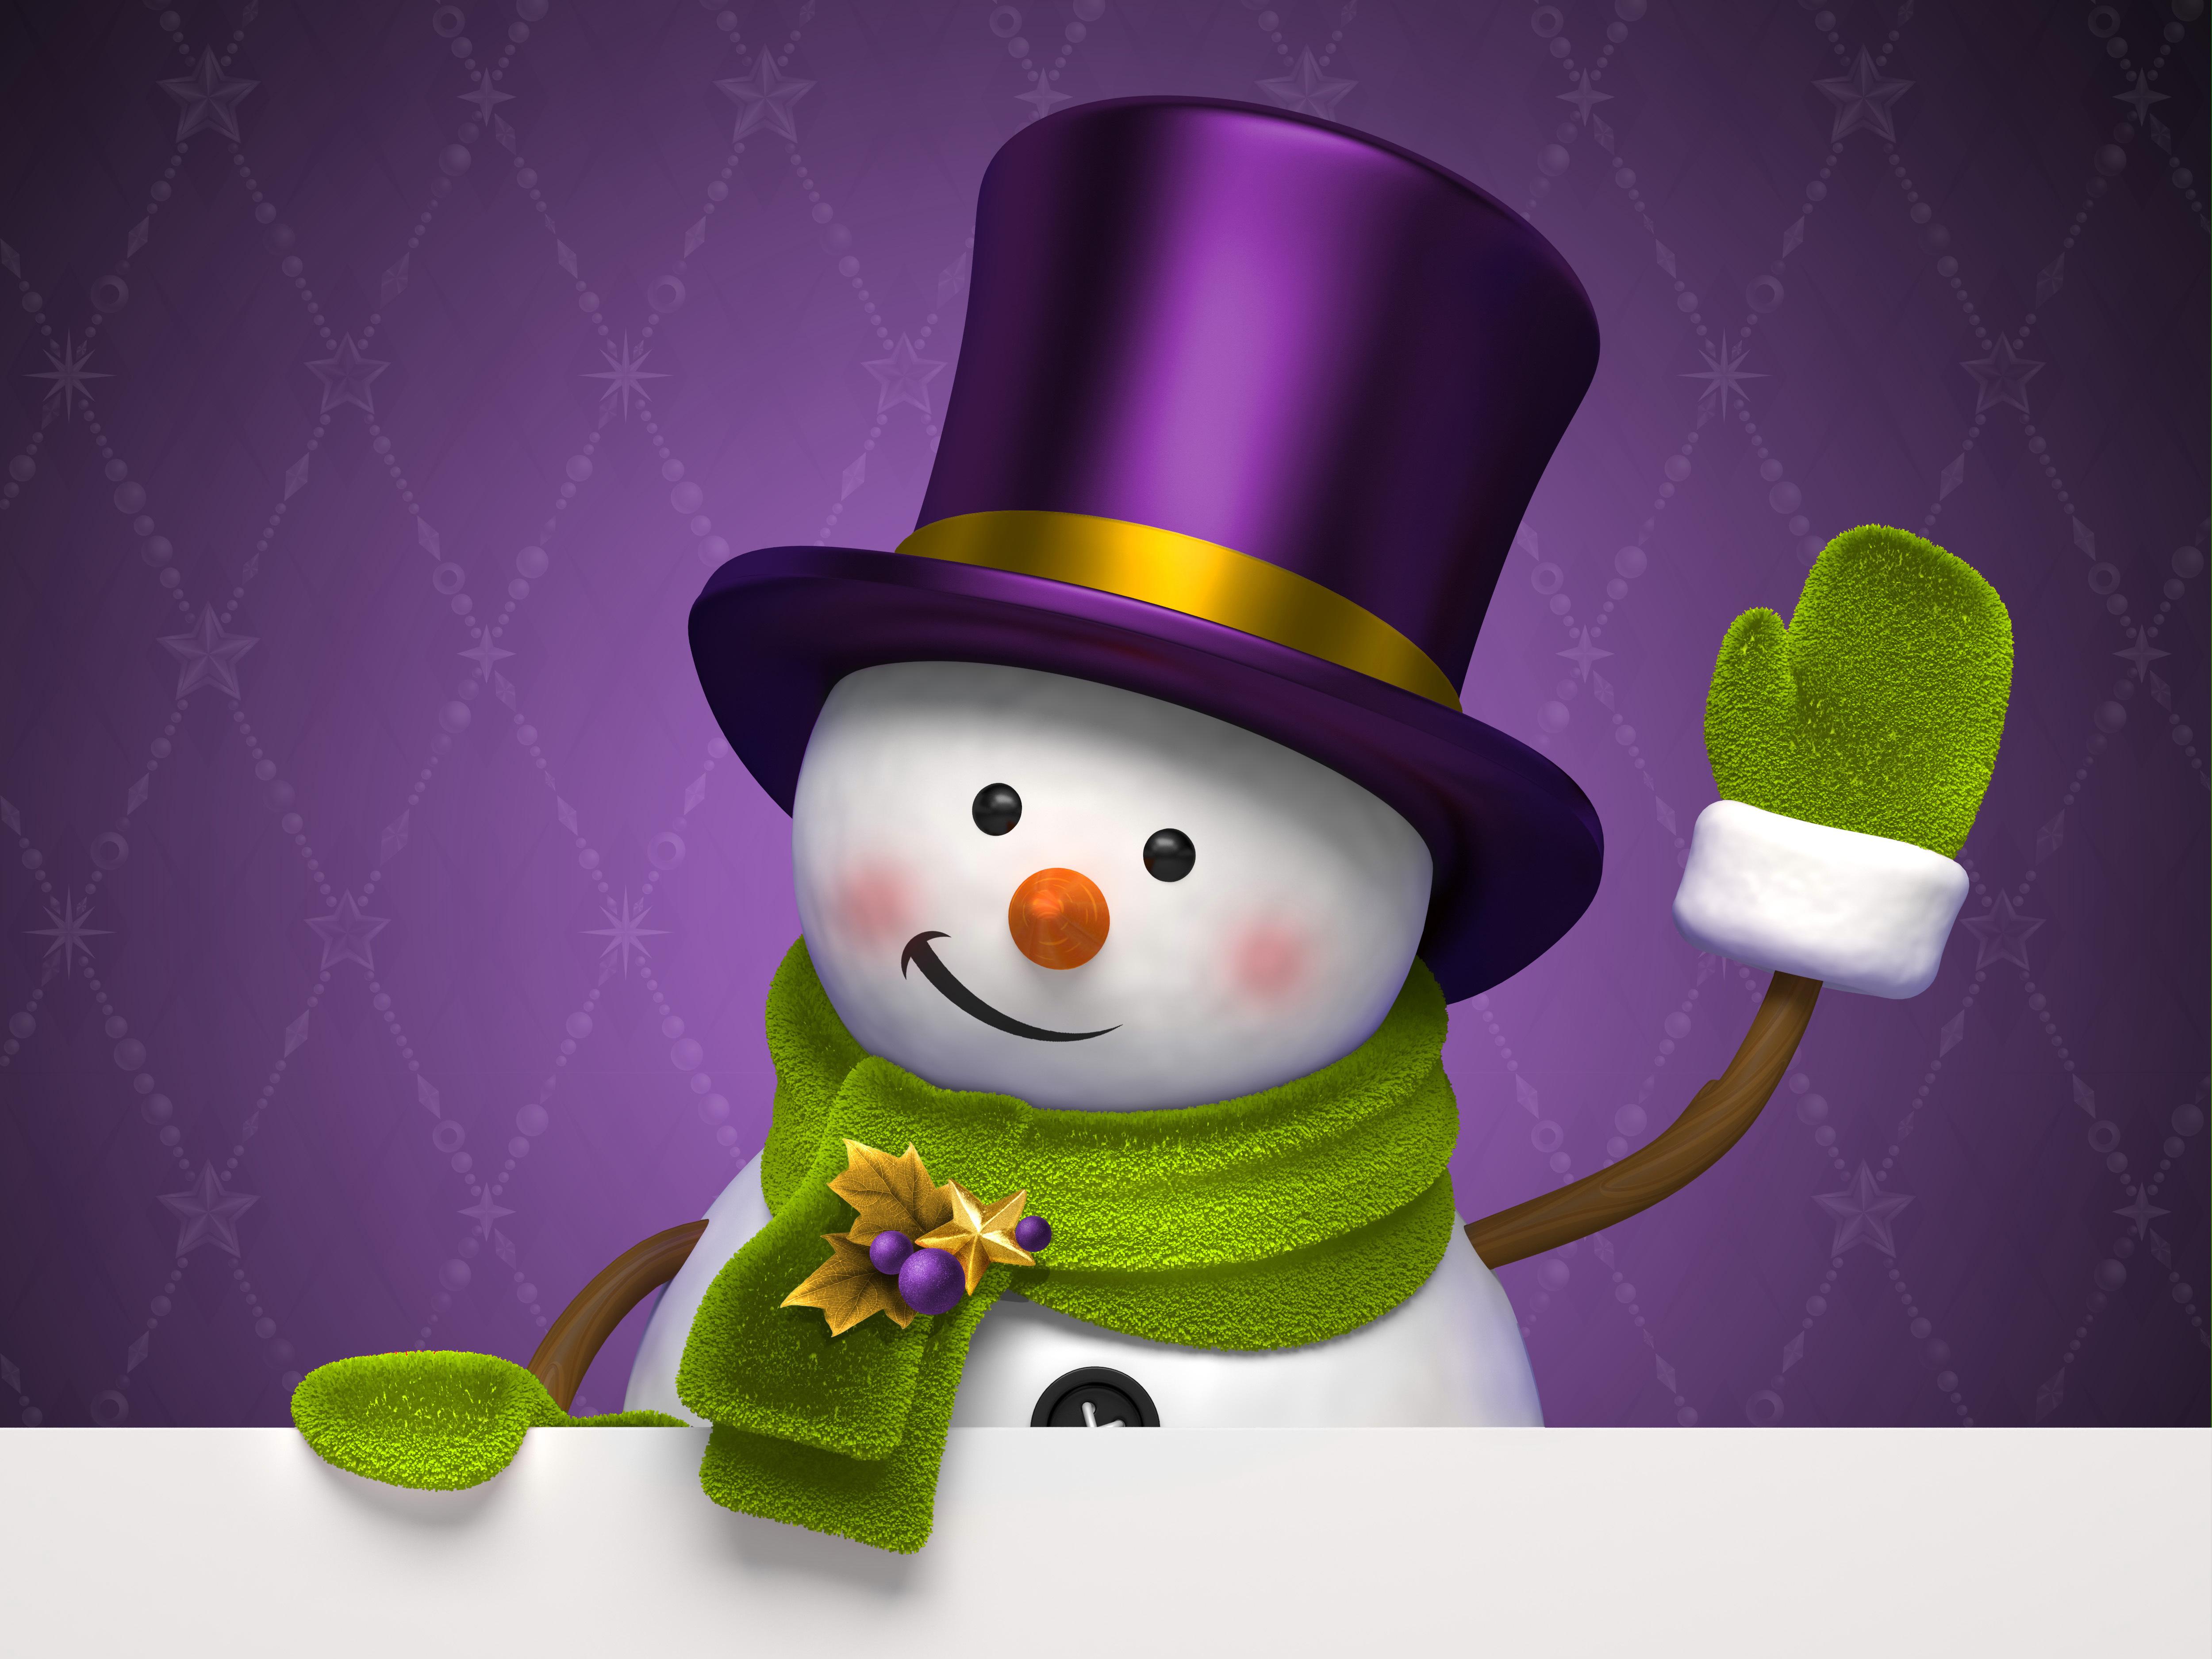 Snowman clipart purple Snowman full Gallery View